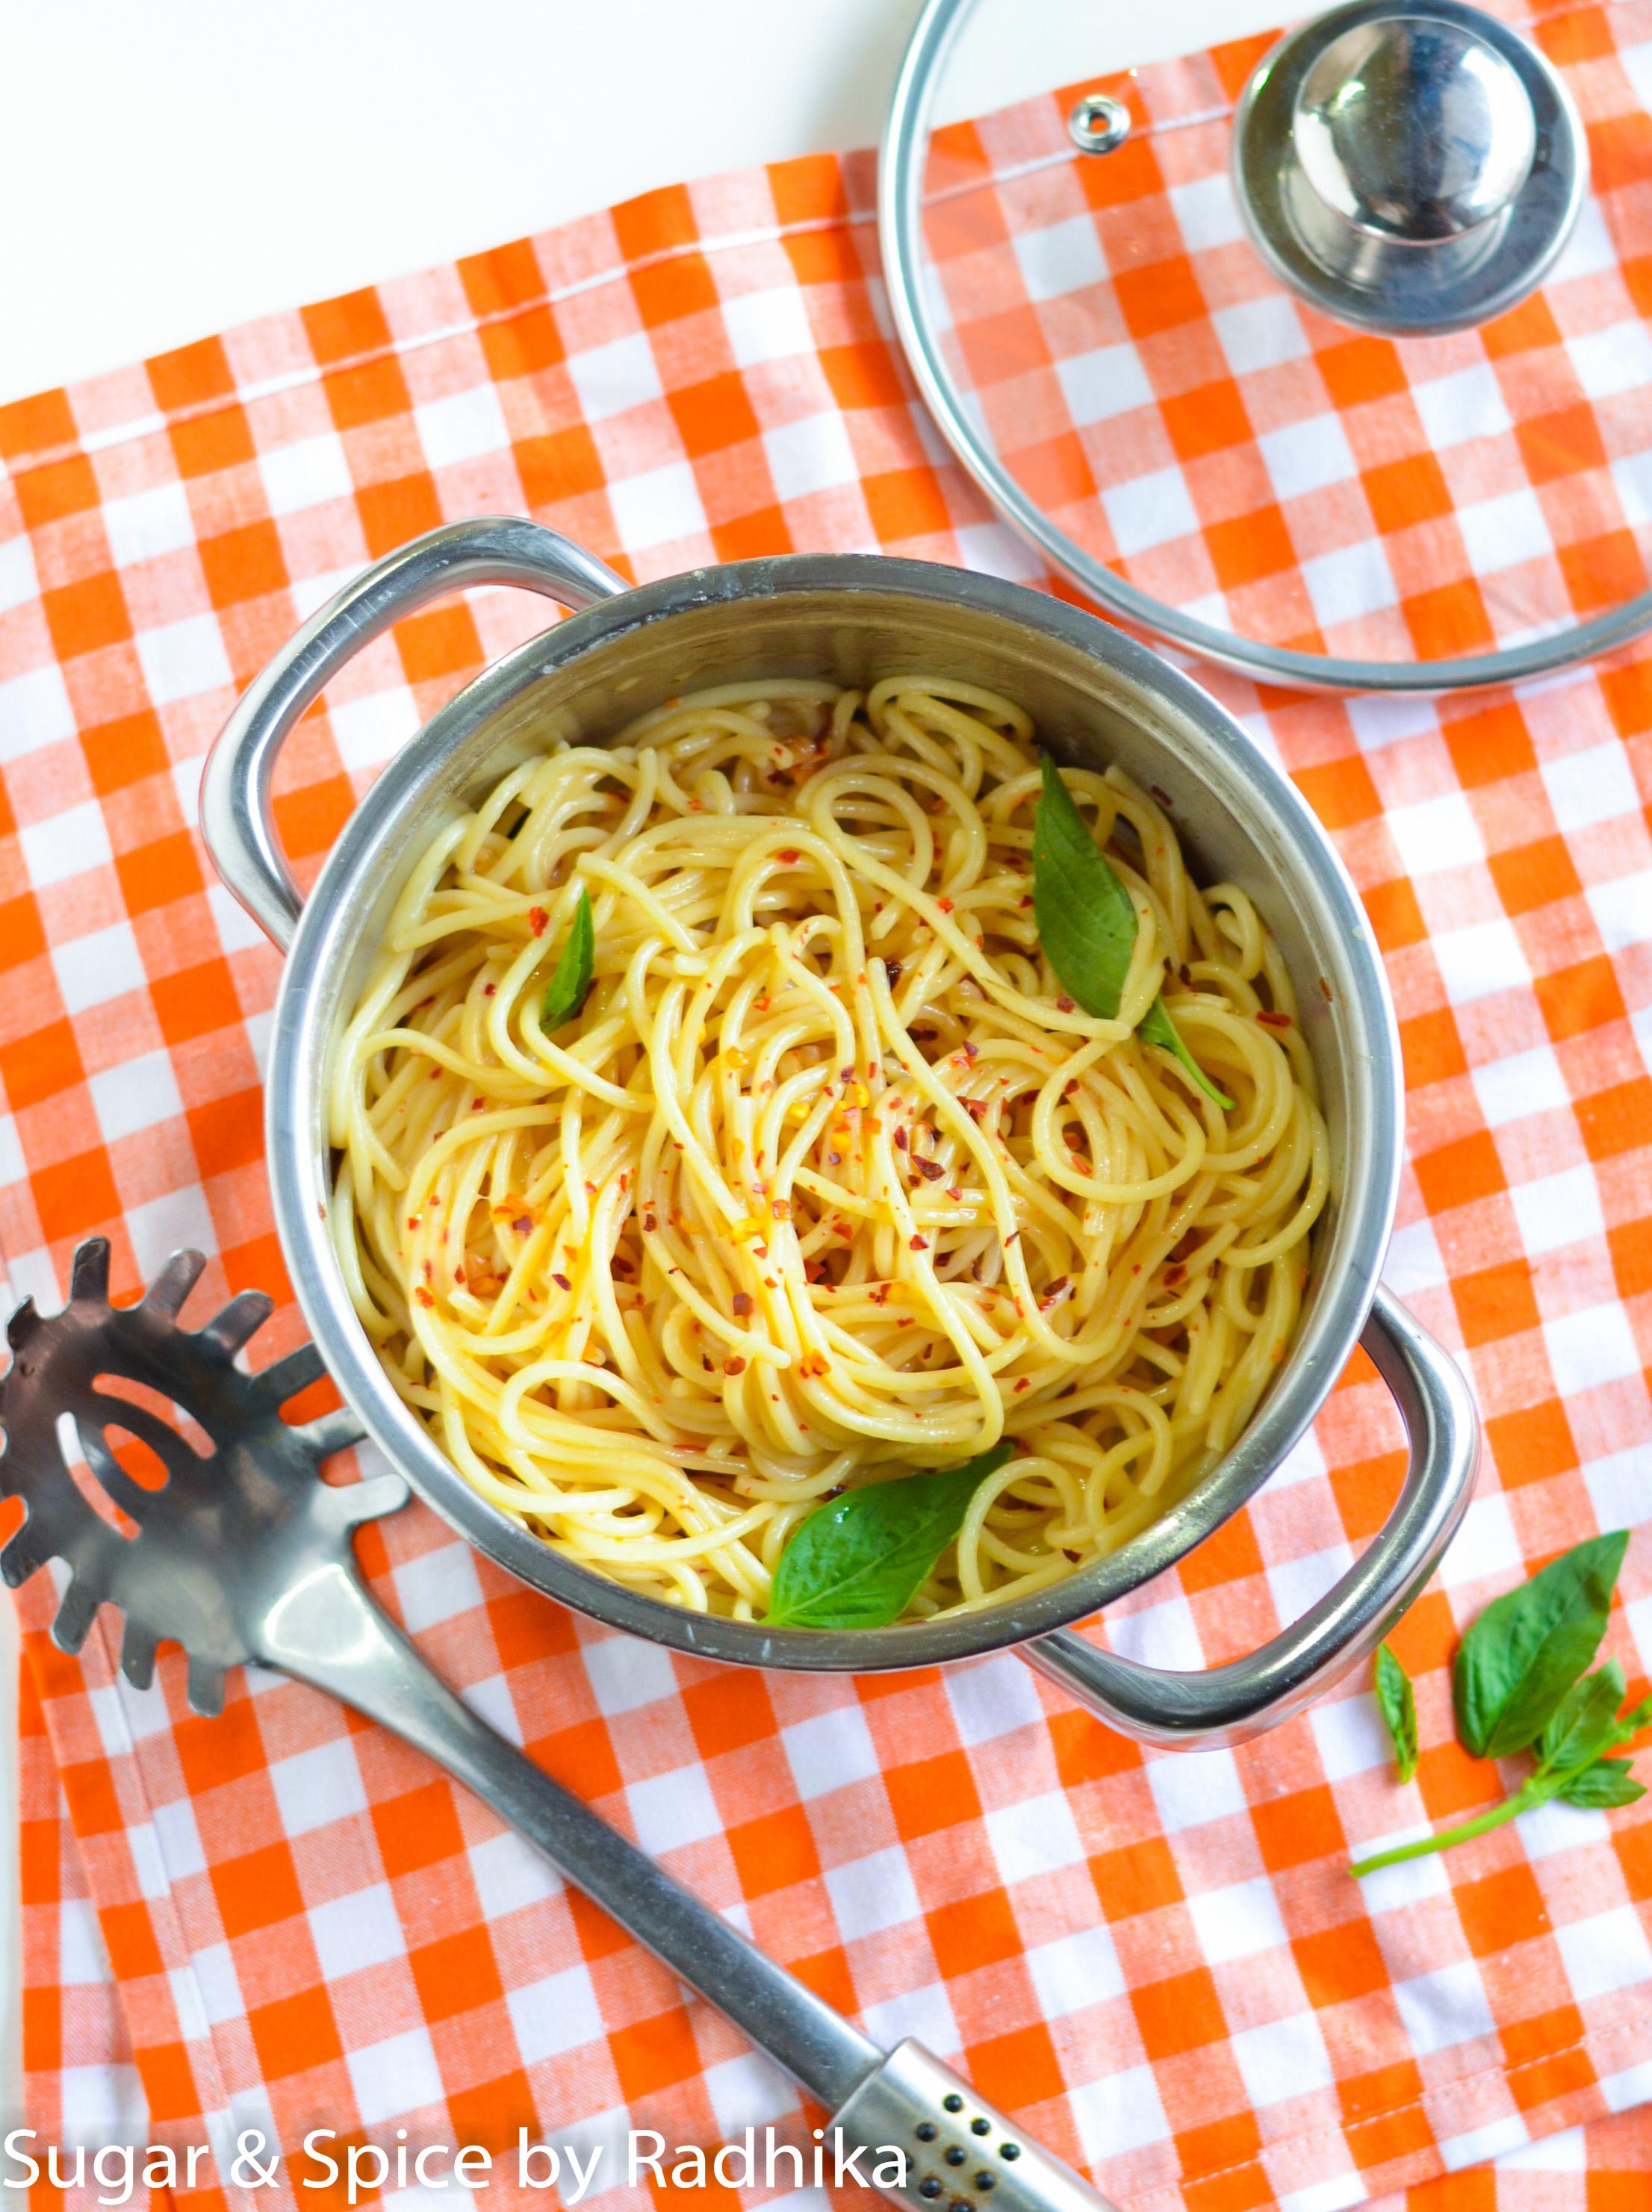 Spaghetti With Garlic Olive Oil And Chili Flakes Sugar Spice By Radhika